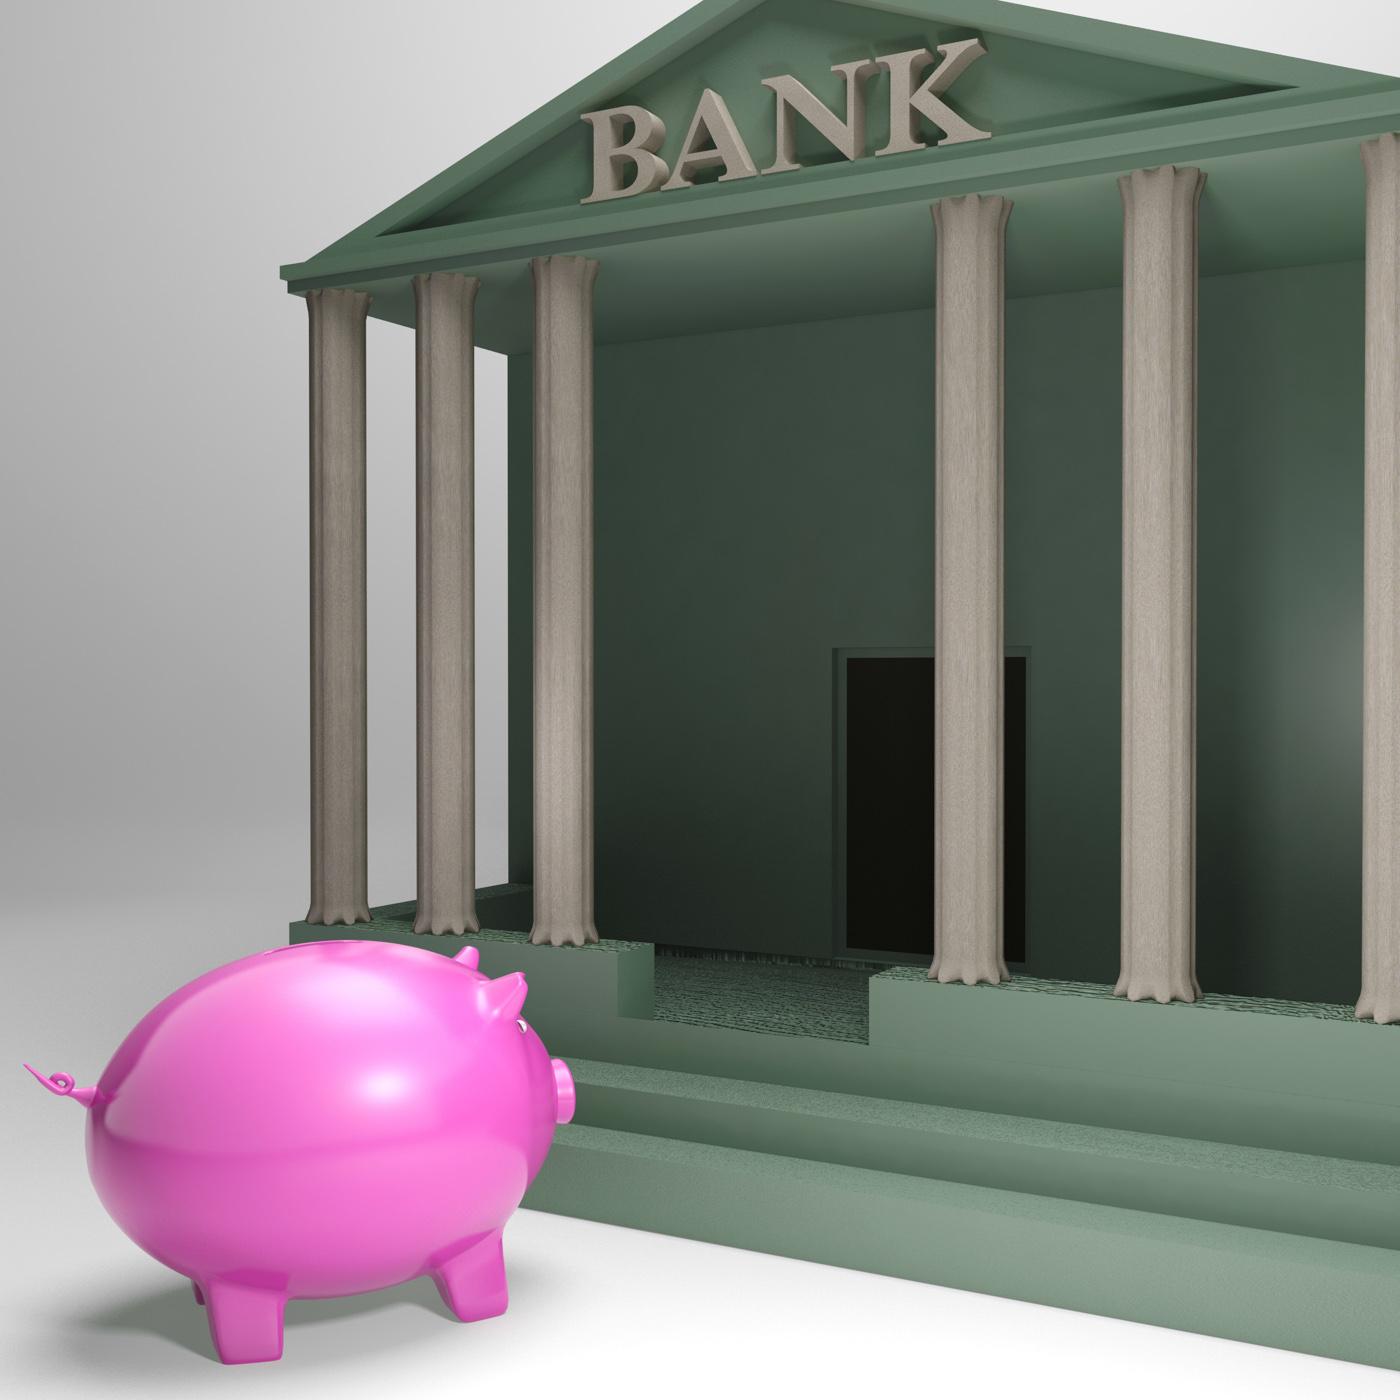 Piggybank Entering Bank Shows Money Loan, Bank, Banking, Business, Earnings, HQ Photo